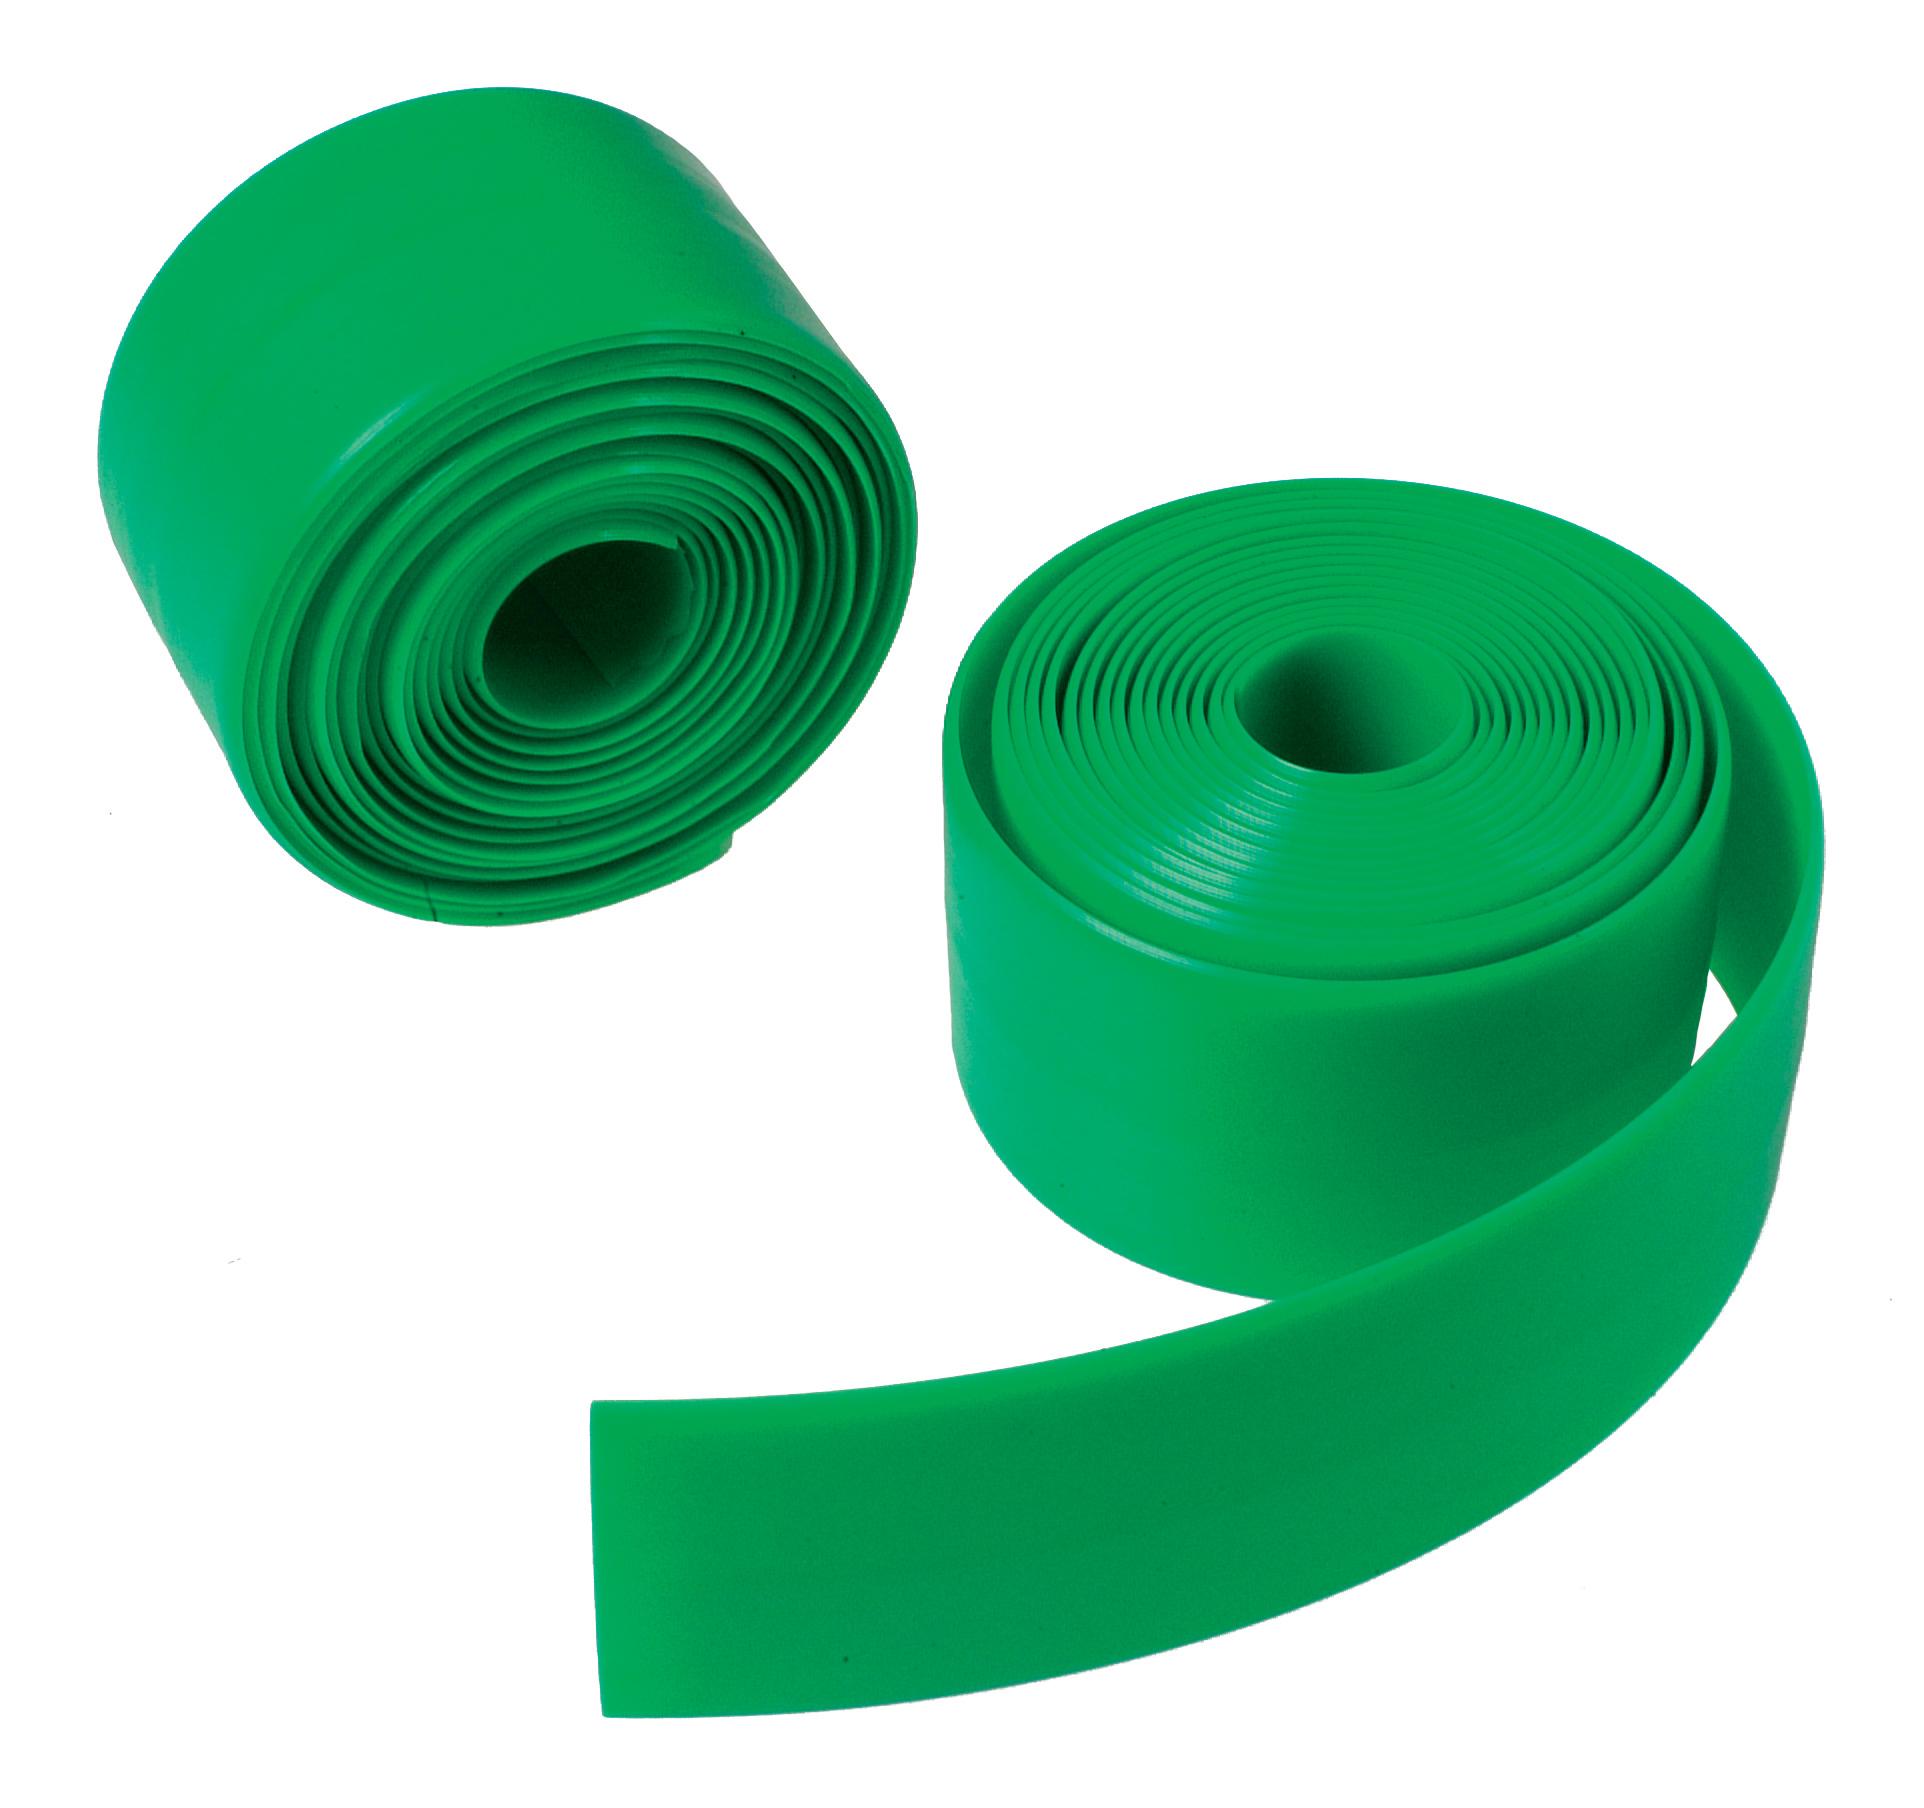 Køb Dækindlæg Proline 700 x 37-47 Grøn Atb (sæt a` 2 S